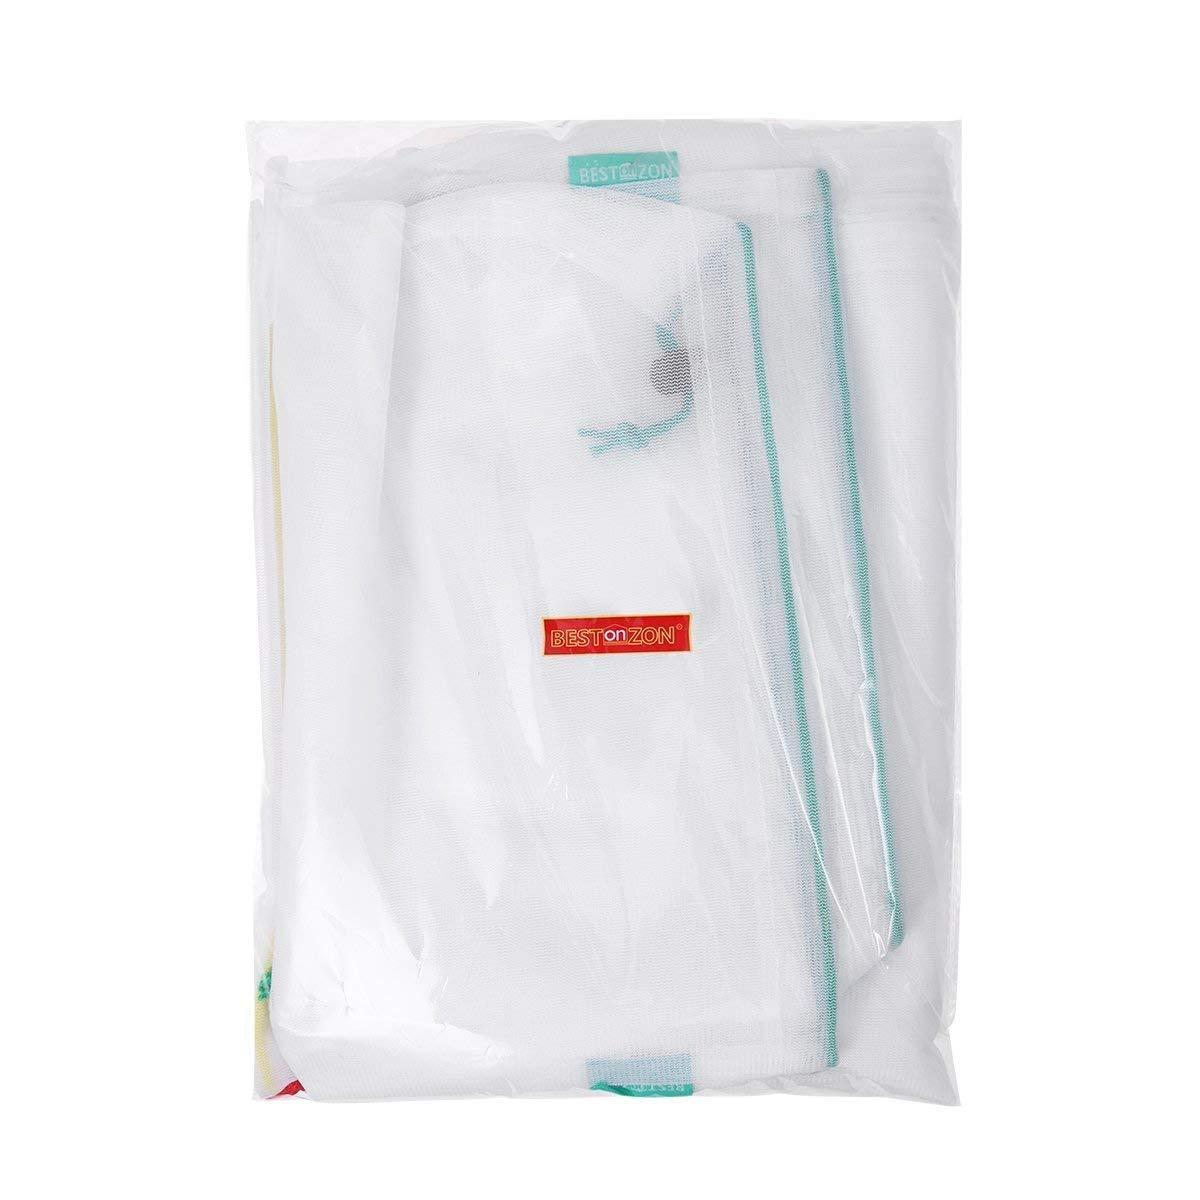 Bestonzon 12pcs Reusable Mesh Produce Bags Washable Eco Friendly Qkz Vk2 Grey For Grocery Shopping Storage Fruit Vegetable